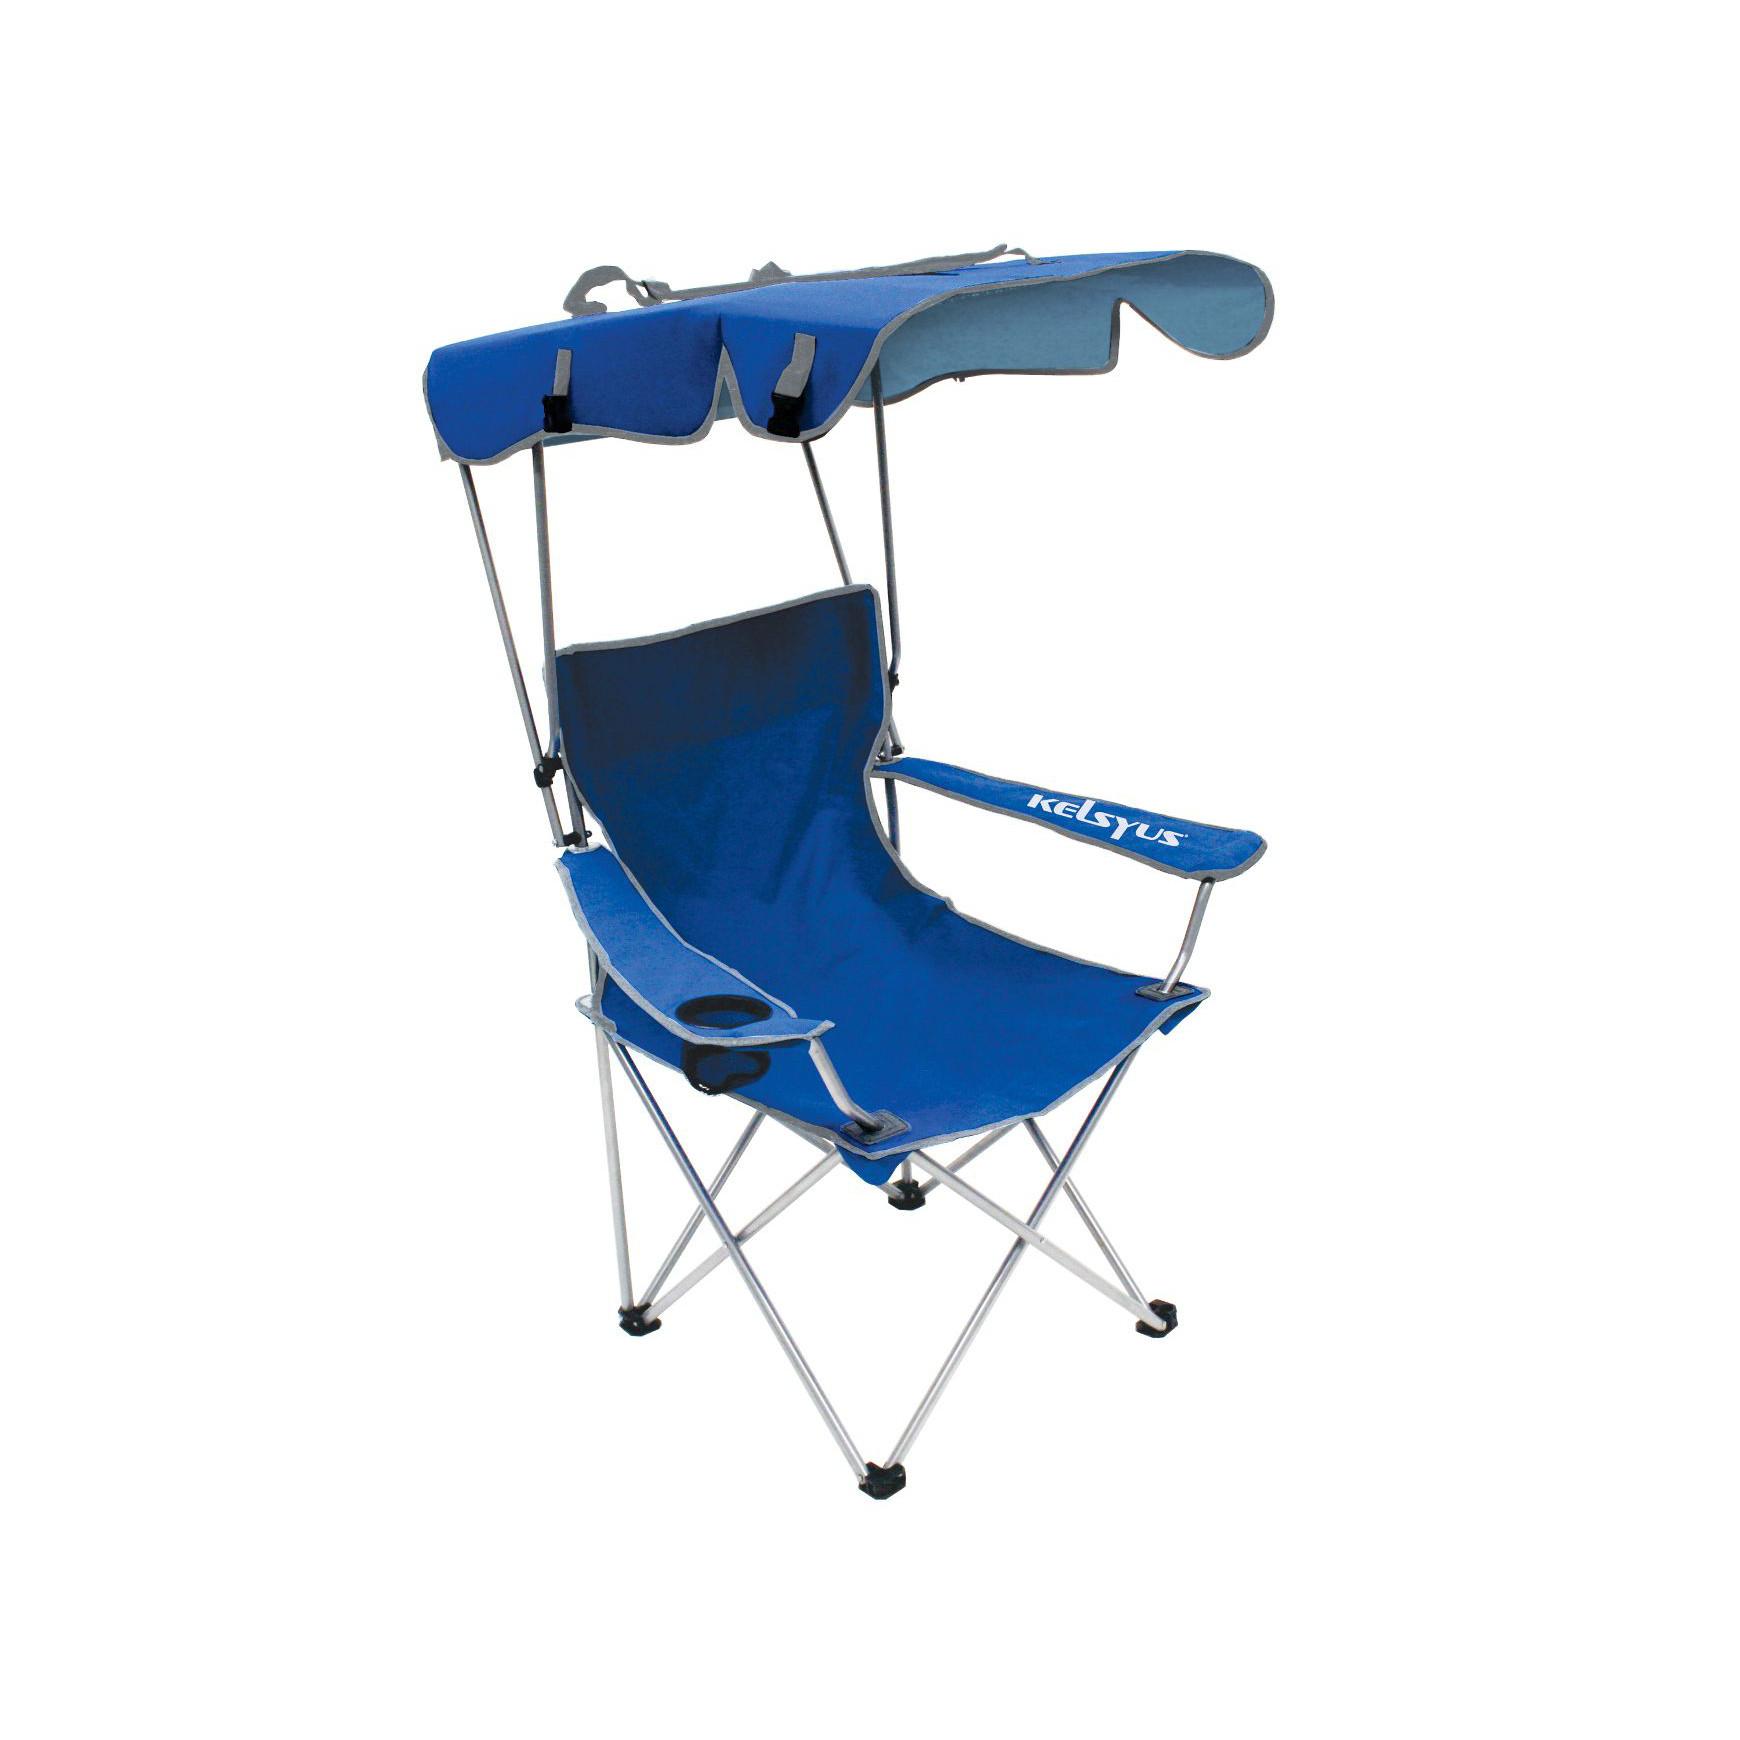 Kelsyus Convertible Canopy Folding Camping Shade Outdoor